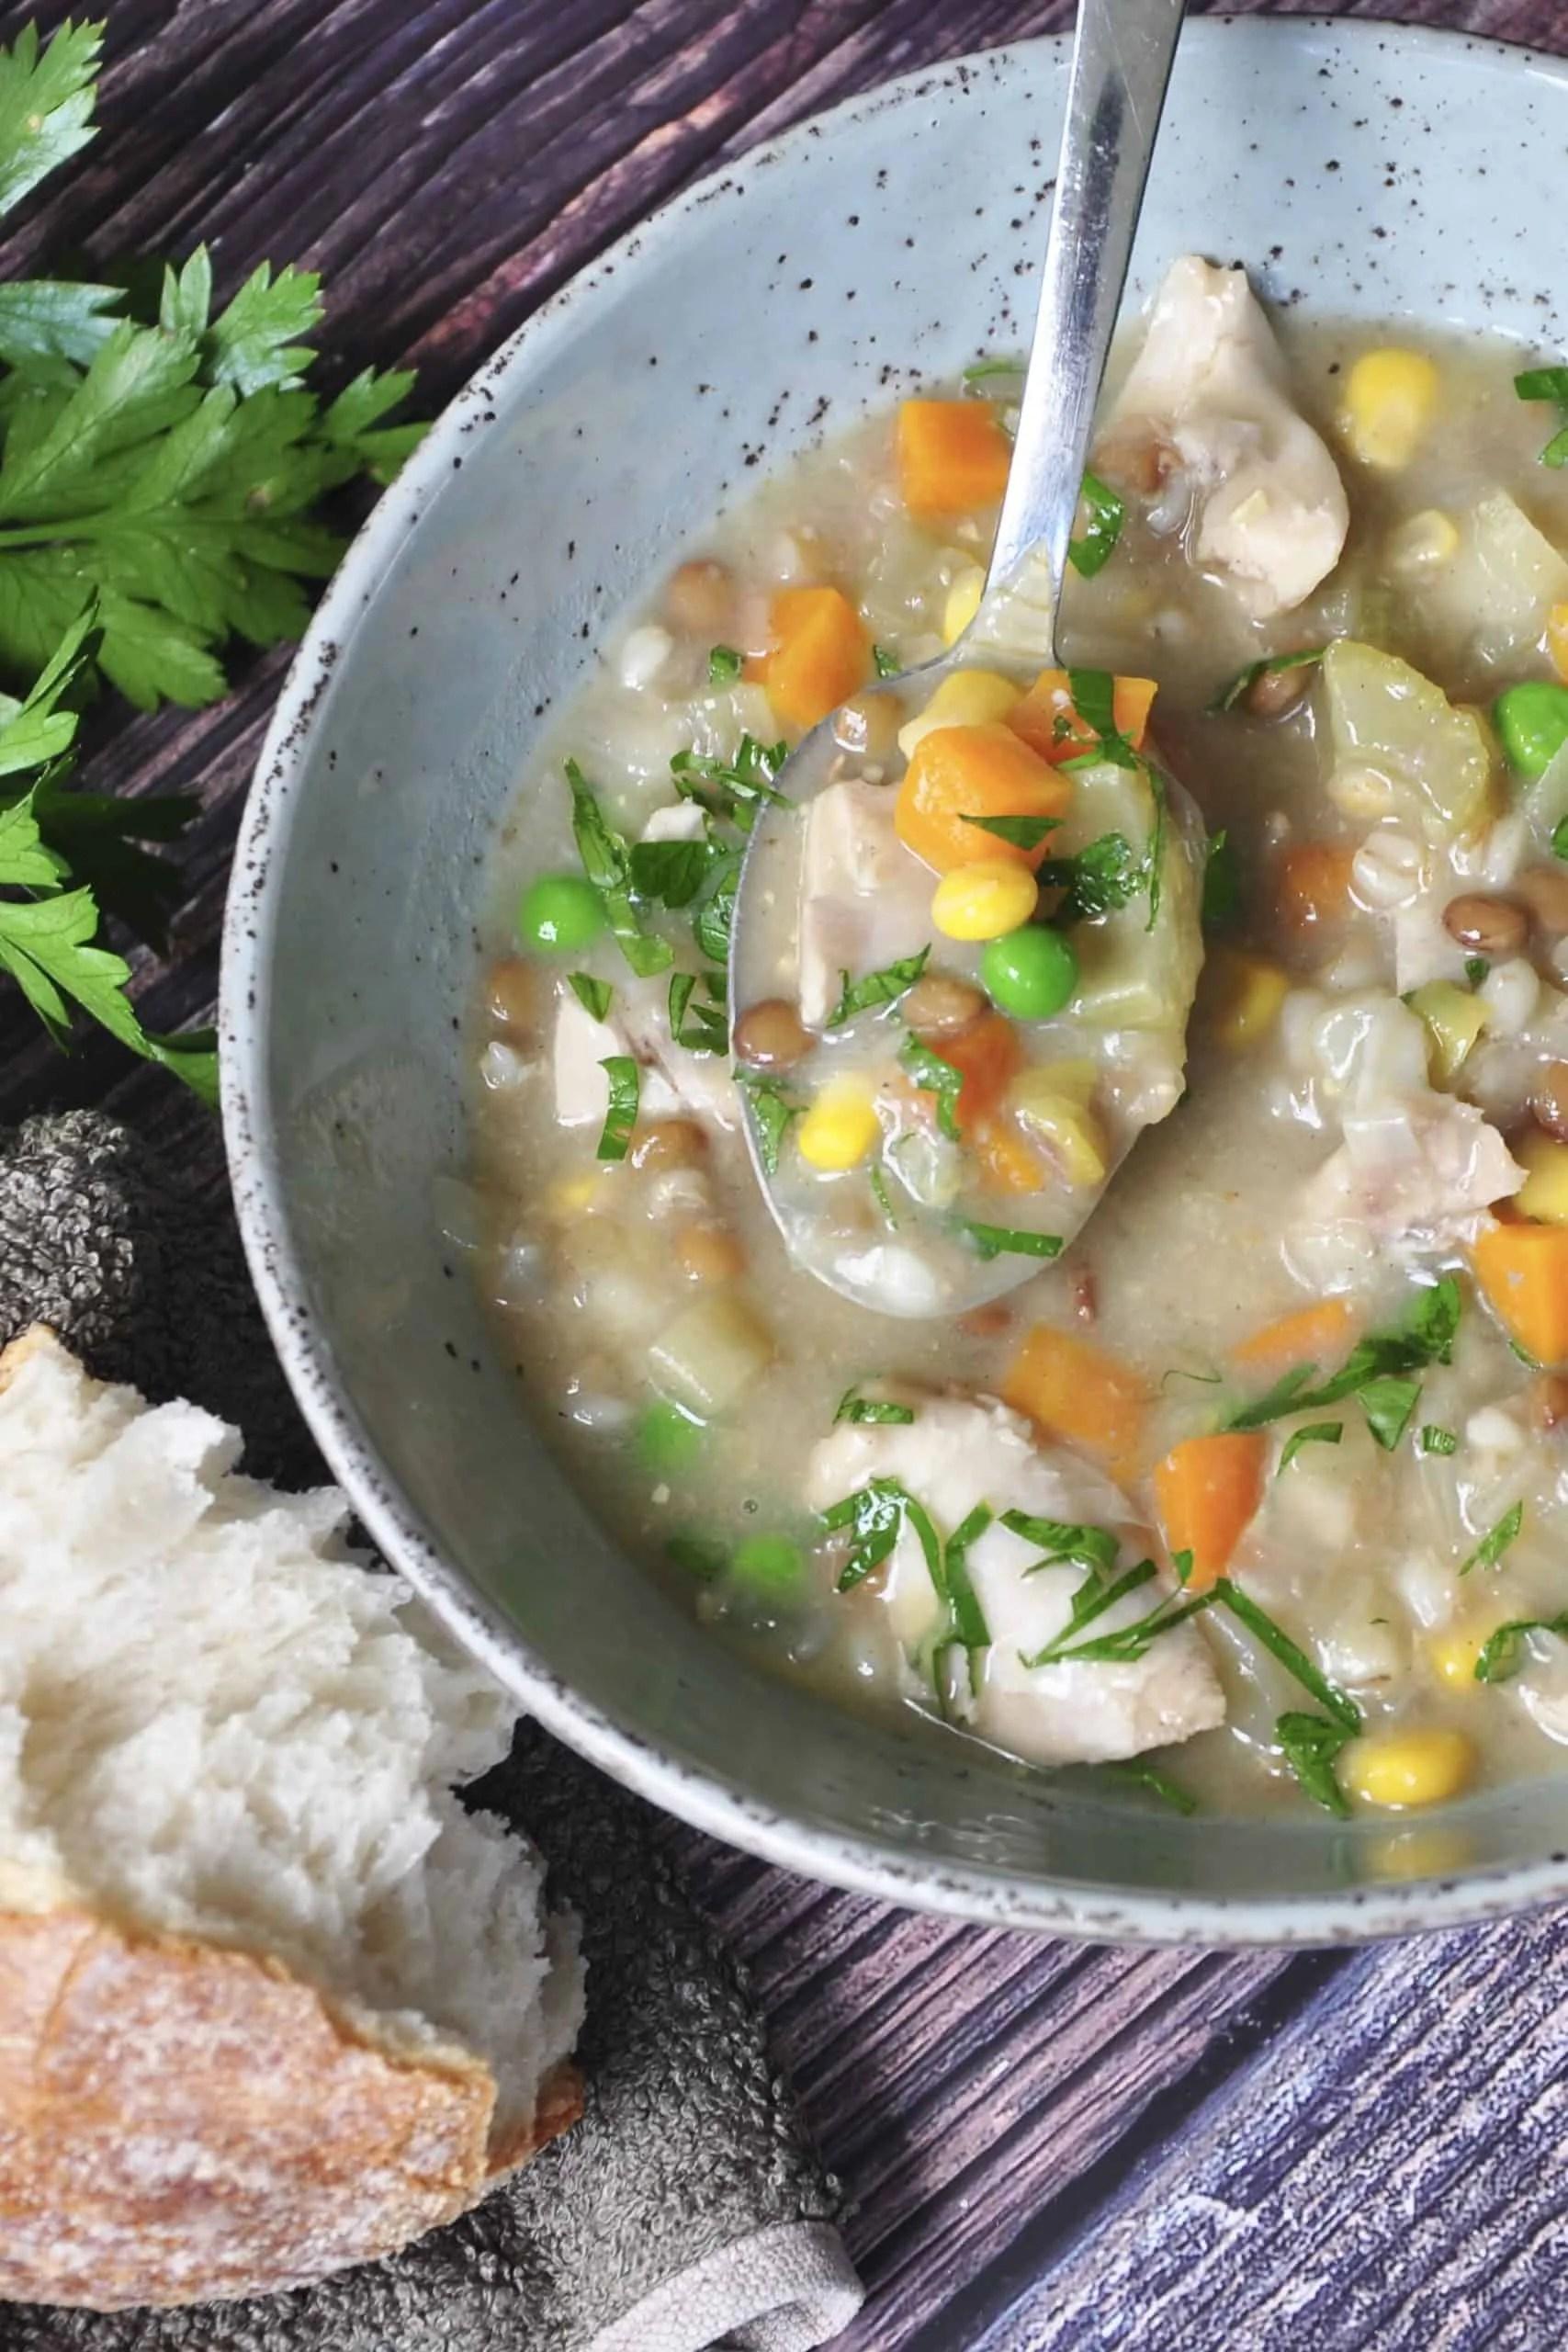 Chicken vegetable and lentil soup